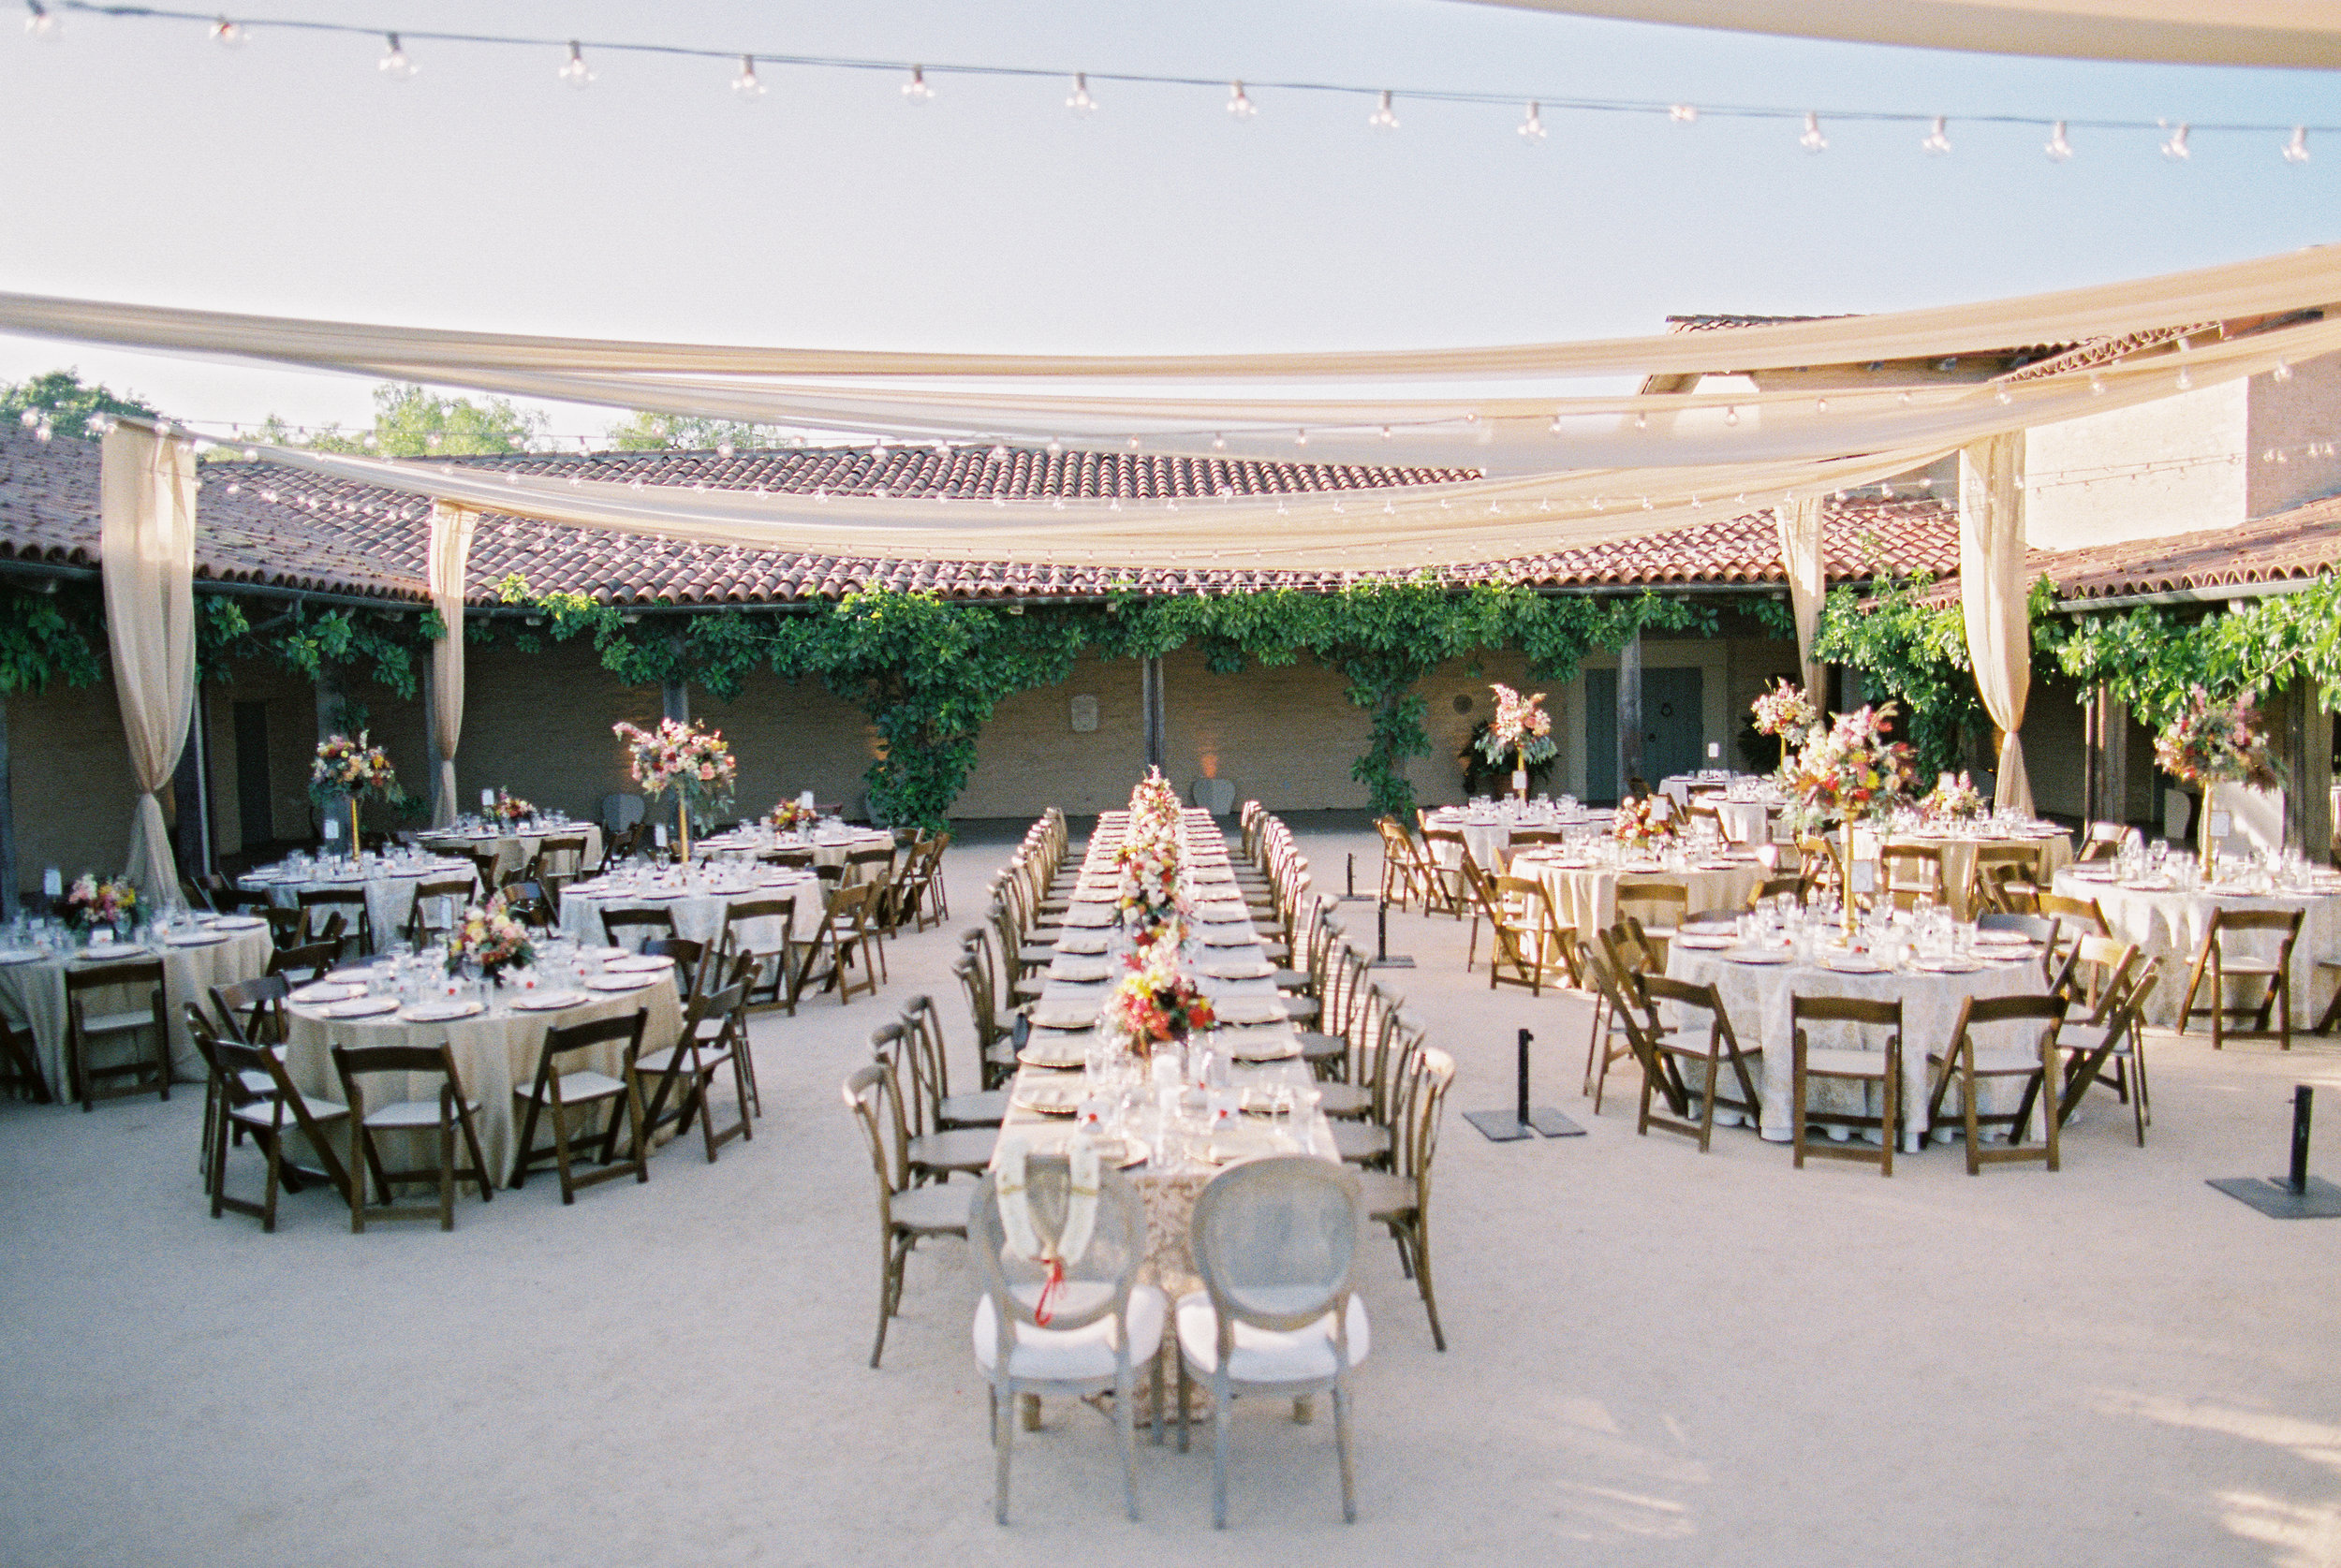 santabarbarawedding.com | photographer: Michael & Anna Costa | Santa Barbara Historical Museum | Wedding Location